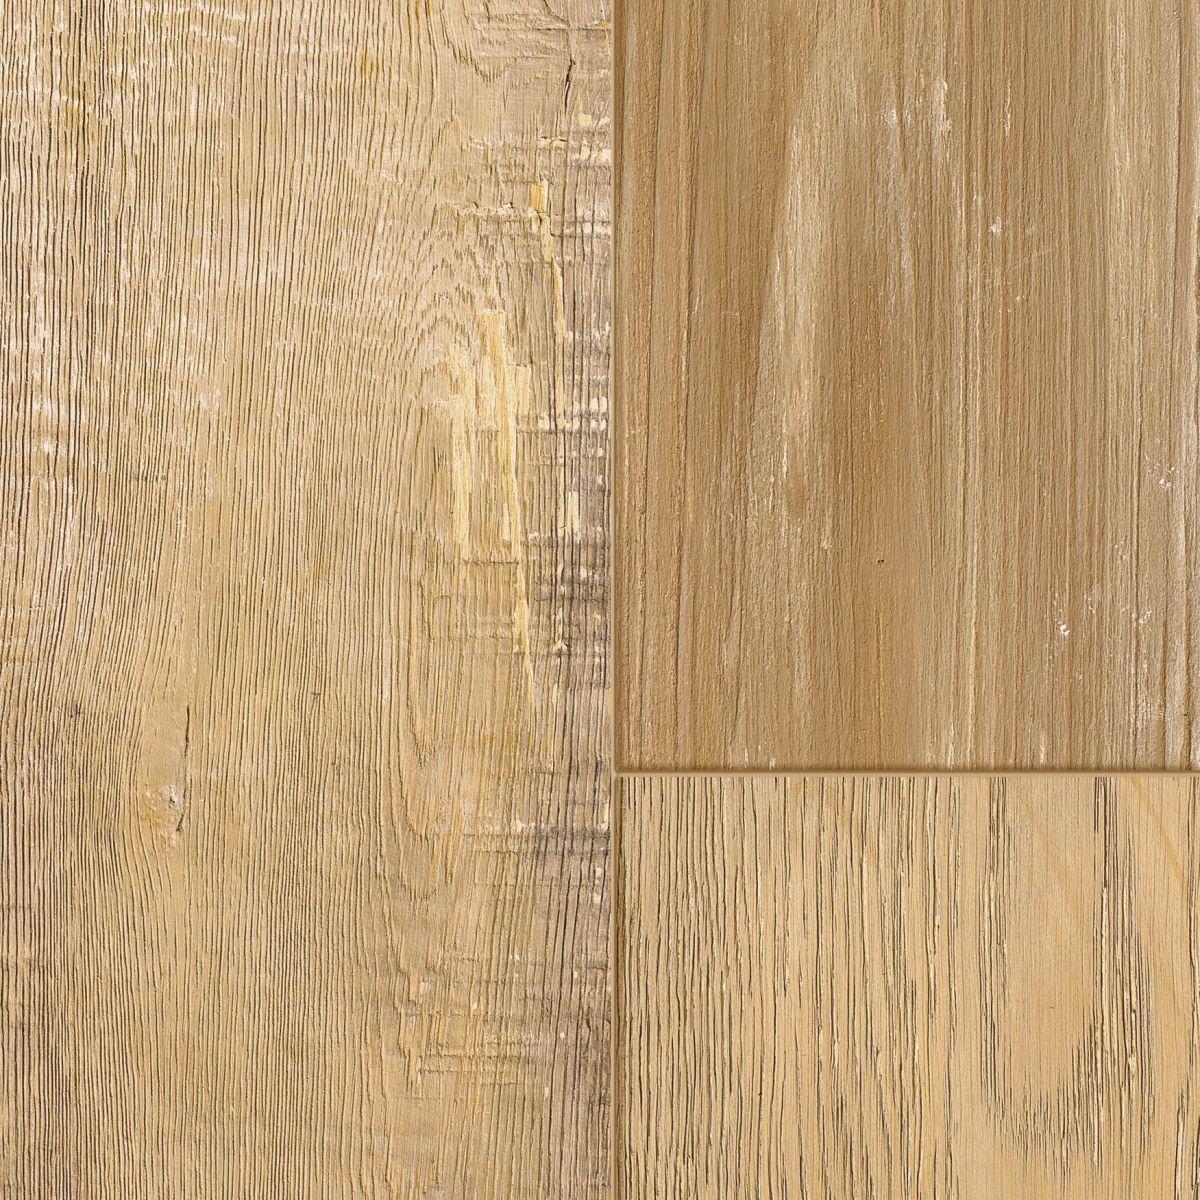 Avatara vloerdelen hout N03 detail